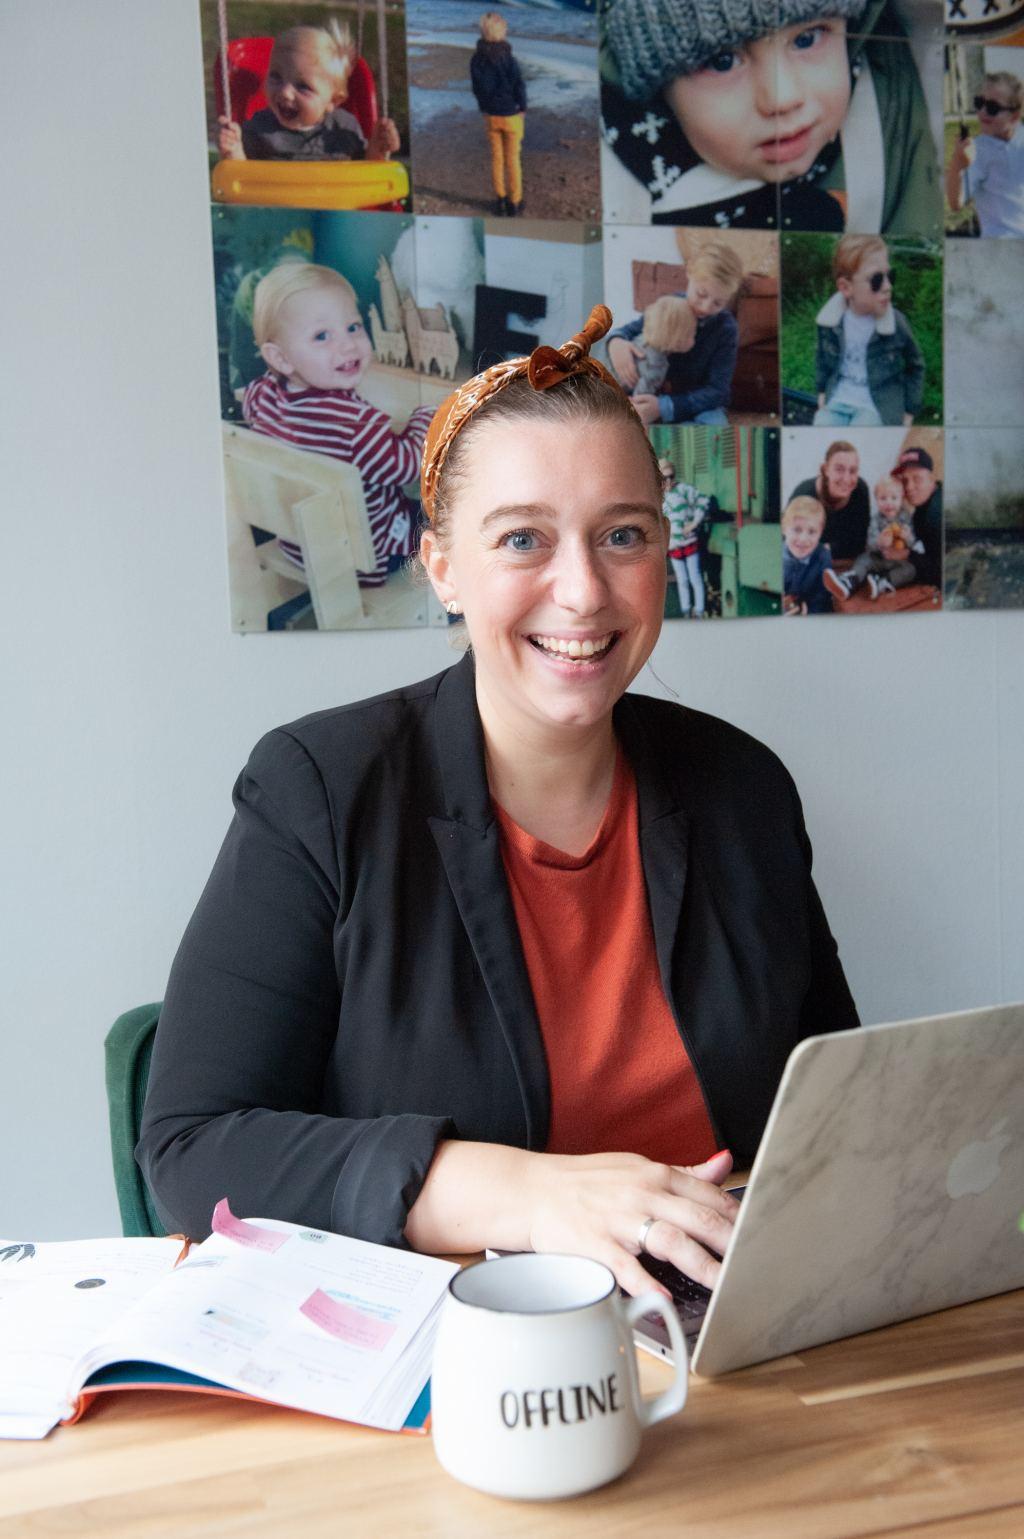 cursussen_trainingen_mamablogger_werk_ontwikkeling_